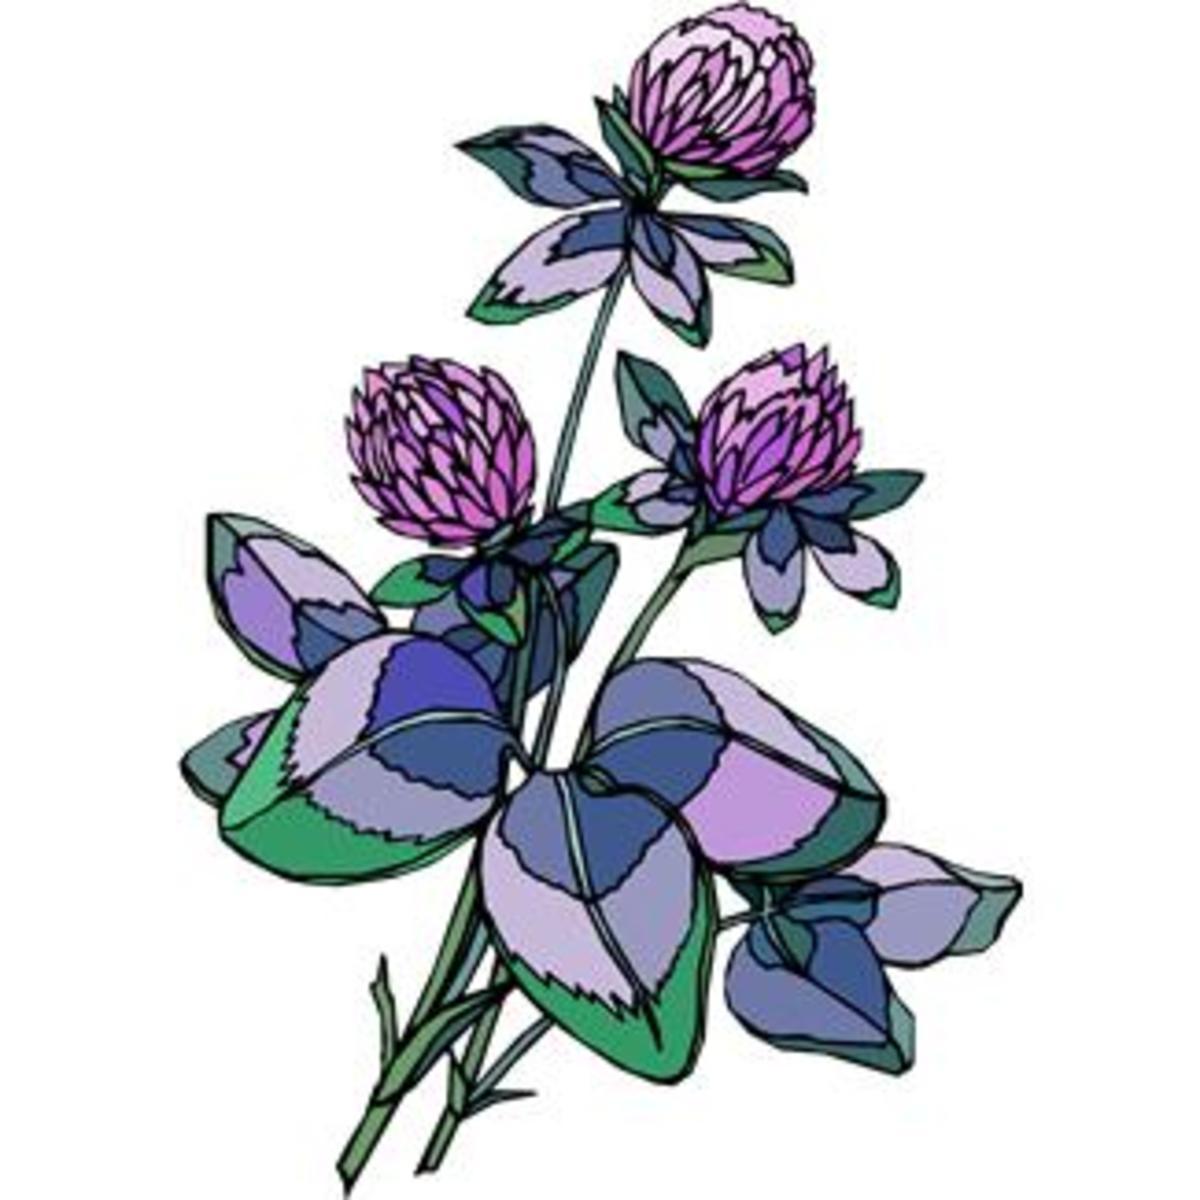 Clover Blooms